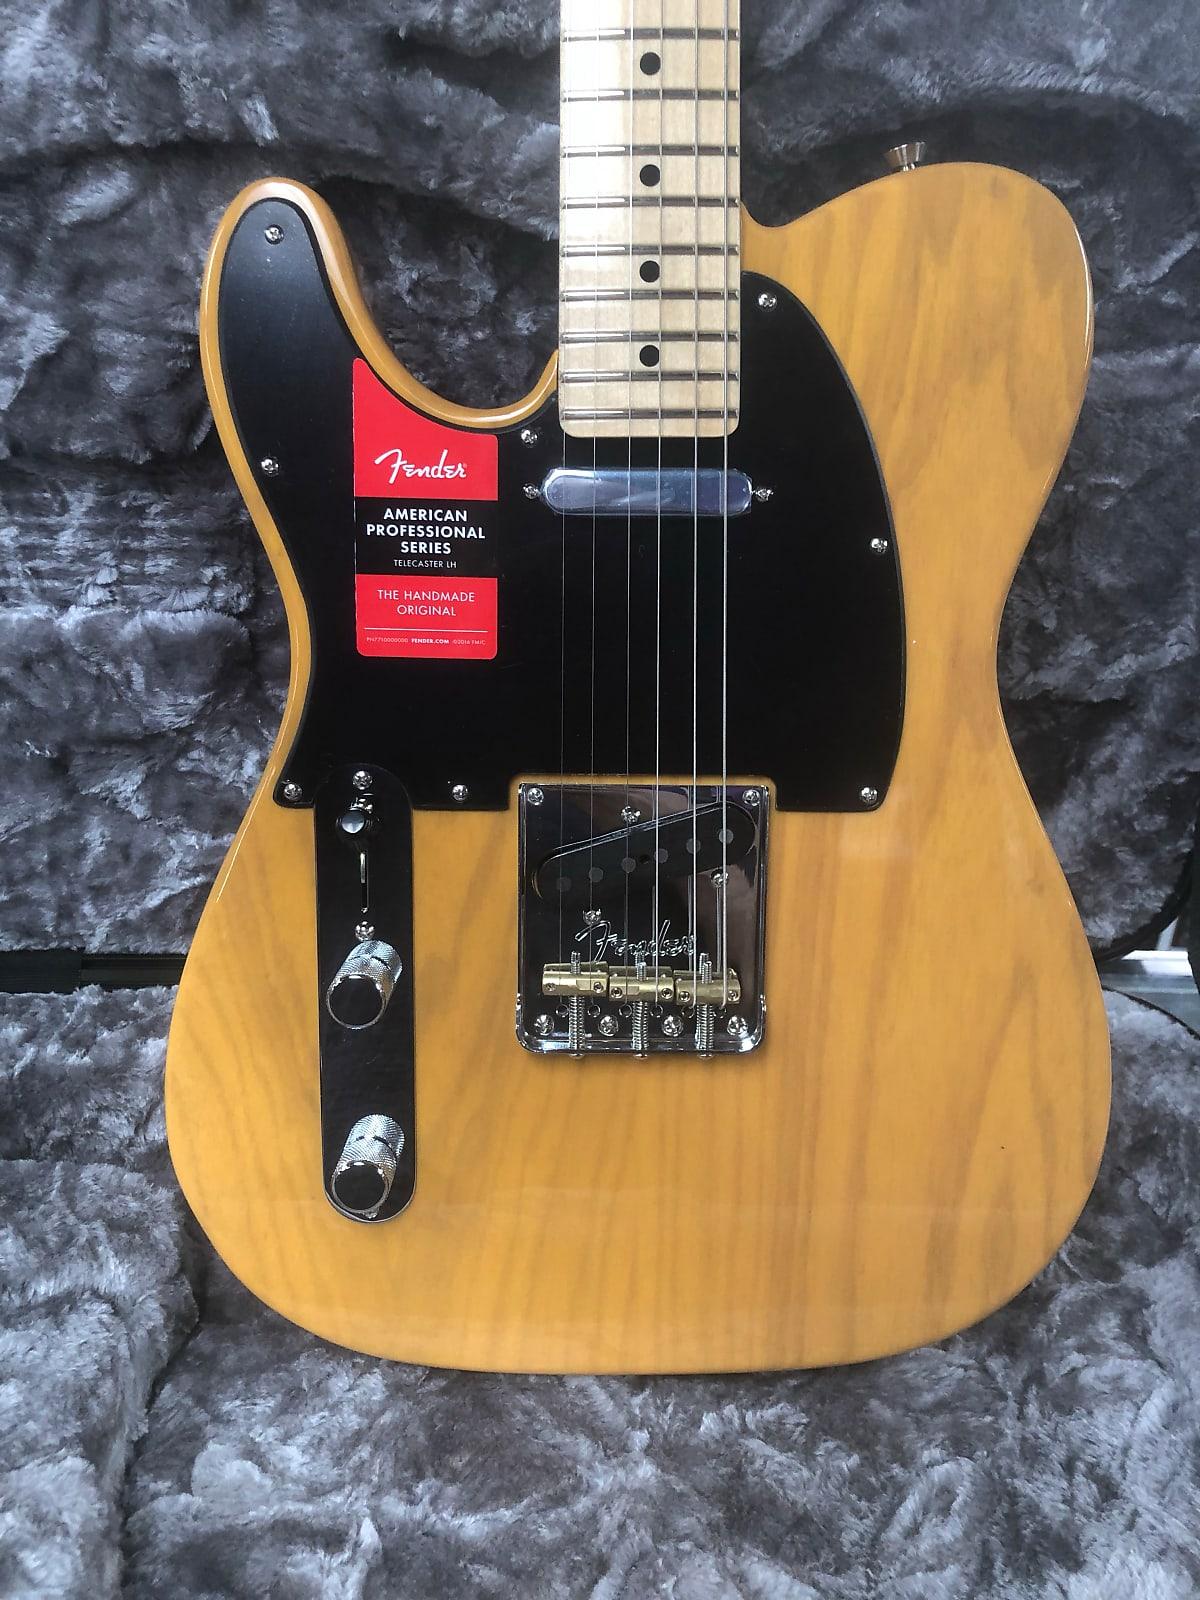 Fender American Pro Telecaster Left-Hand, Maple Fingerboard, Butterscotch Blonde